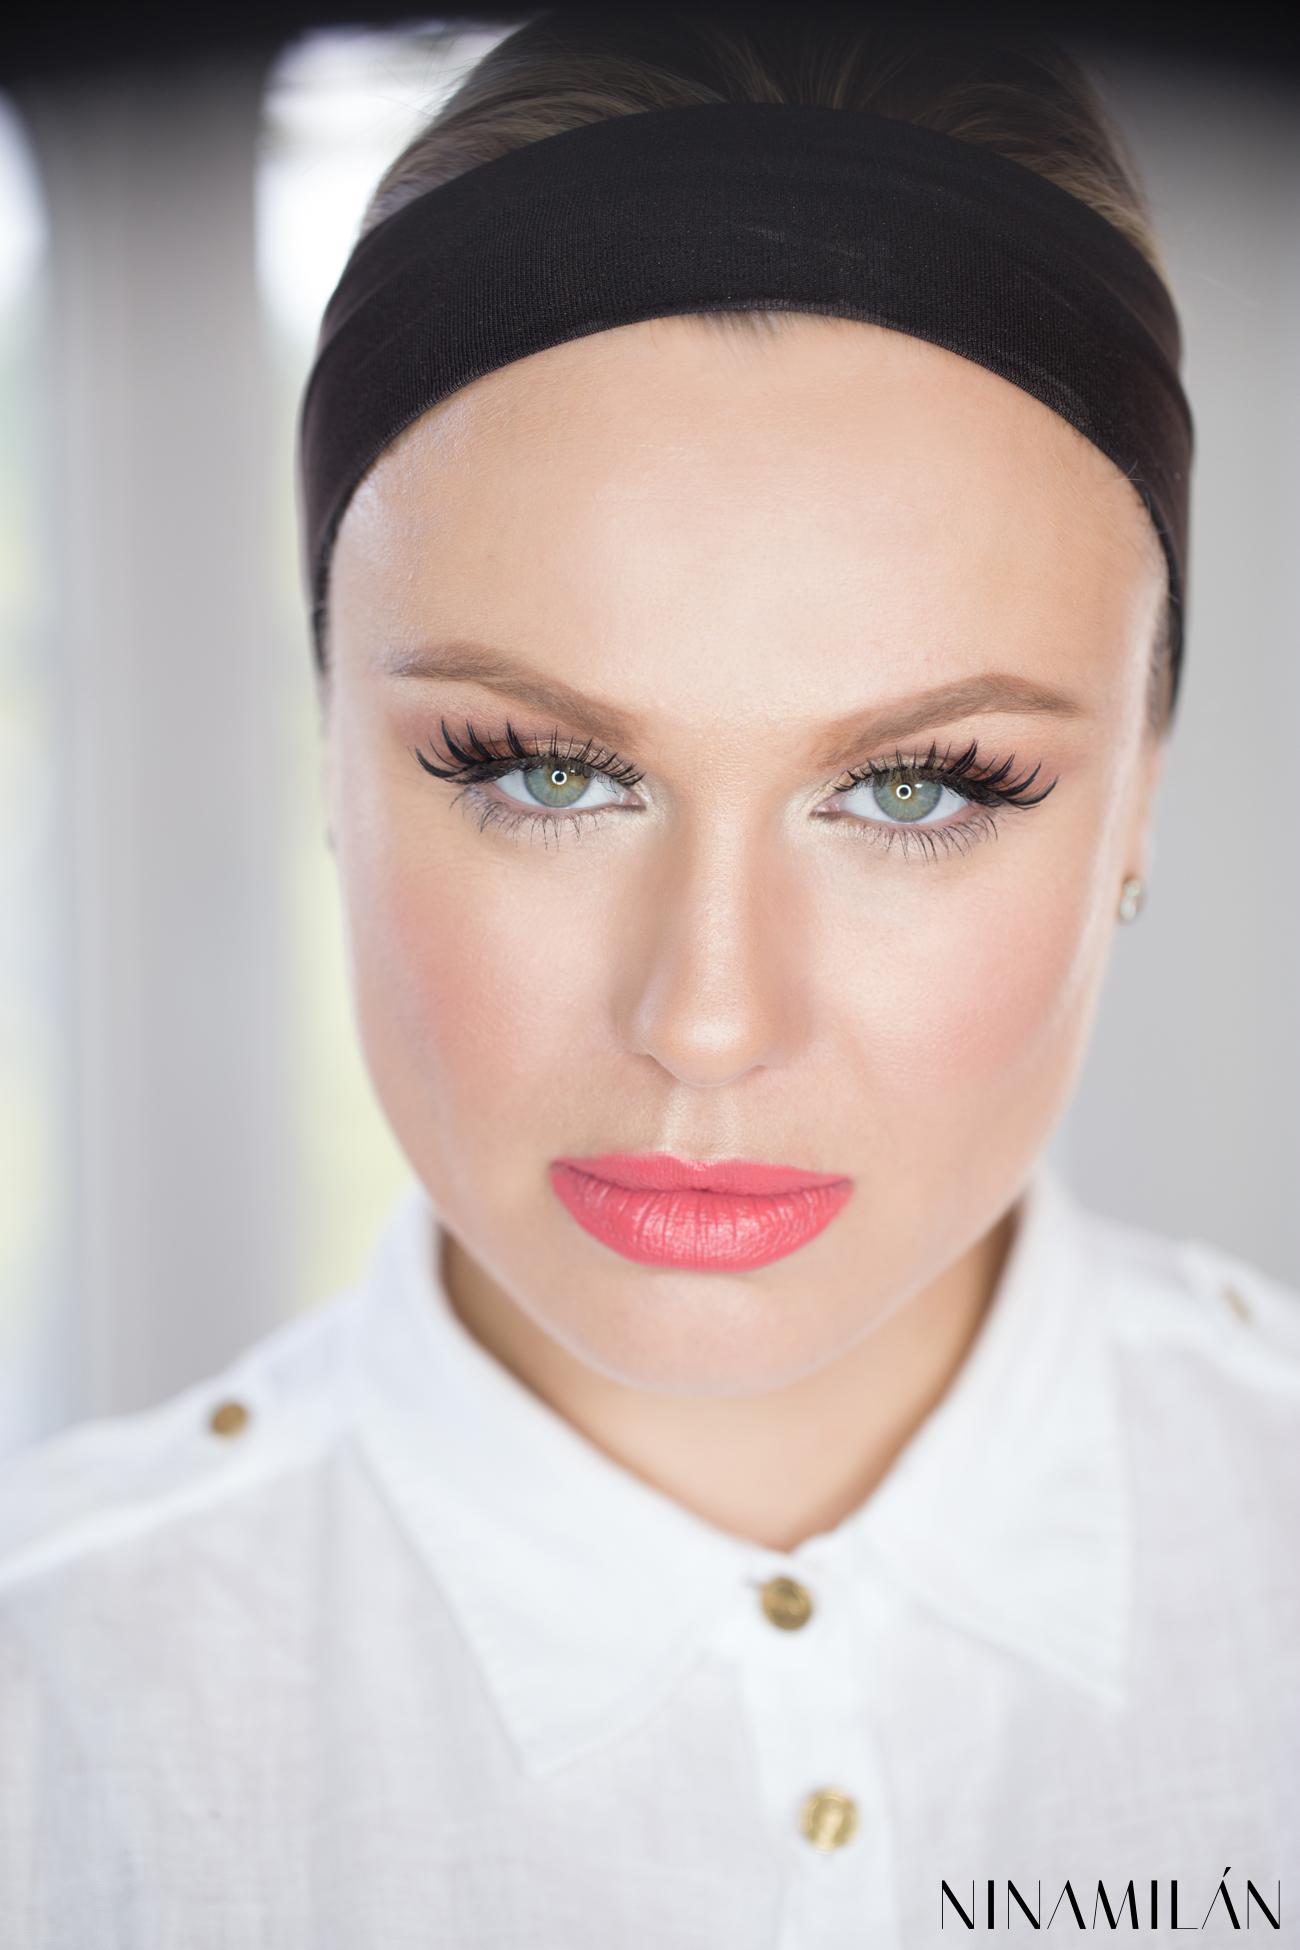 nina i marko makeup (2)